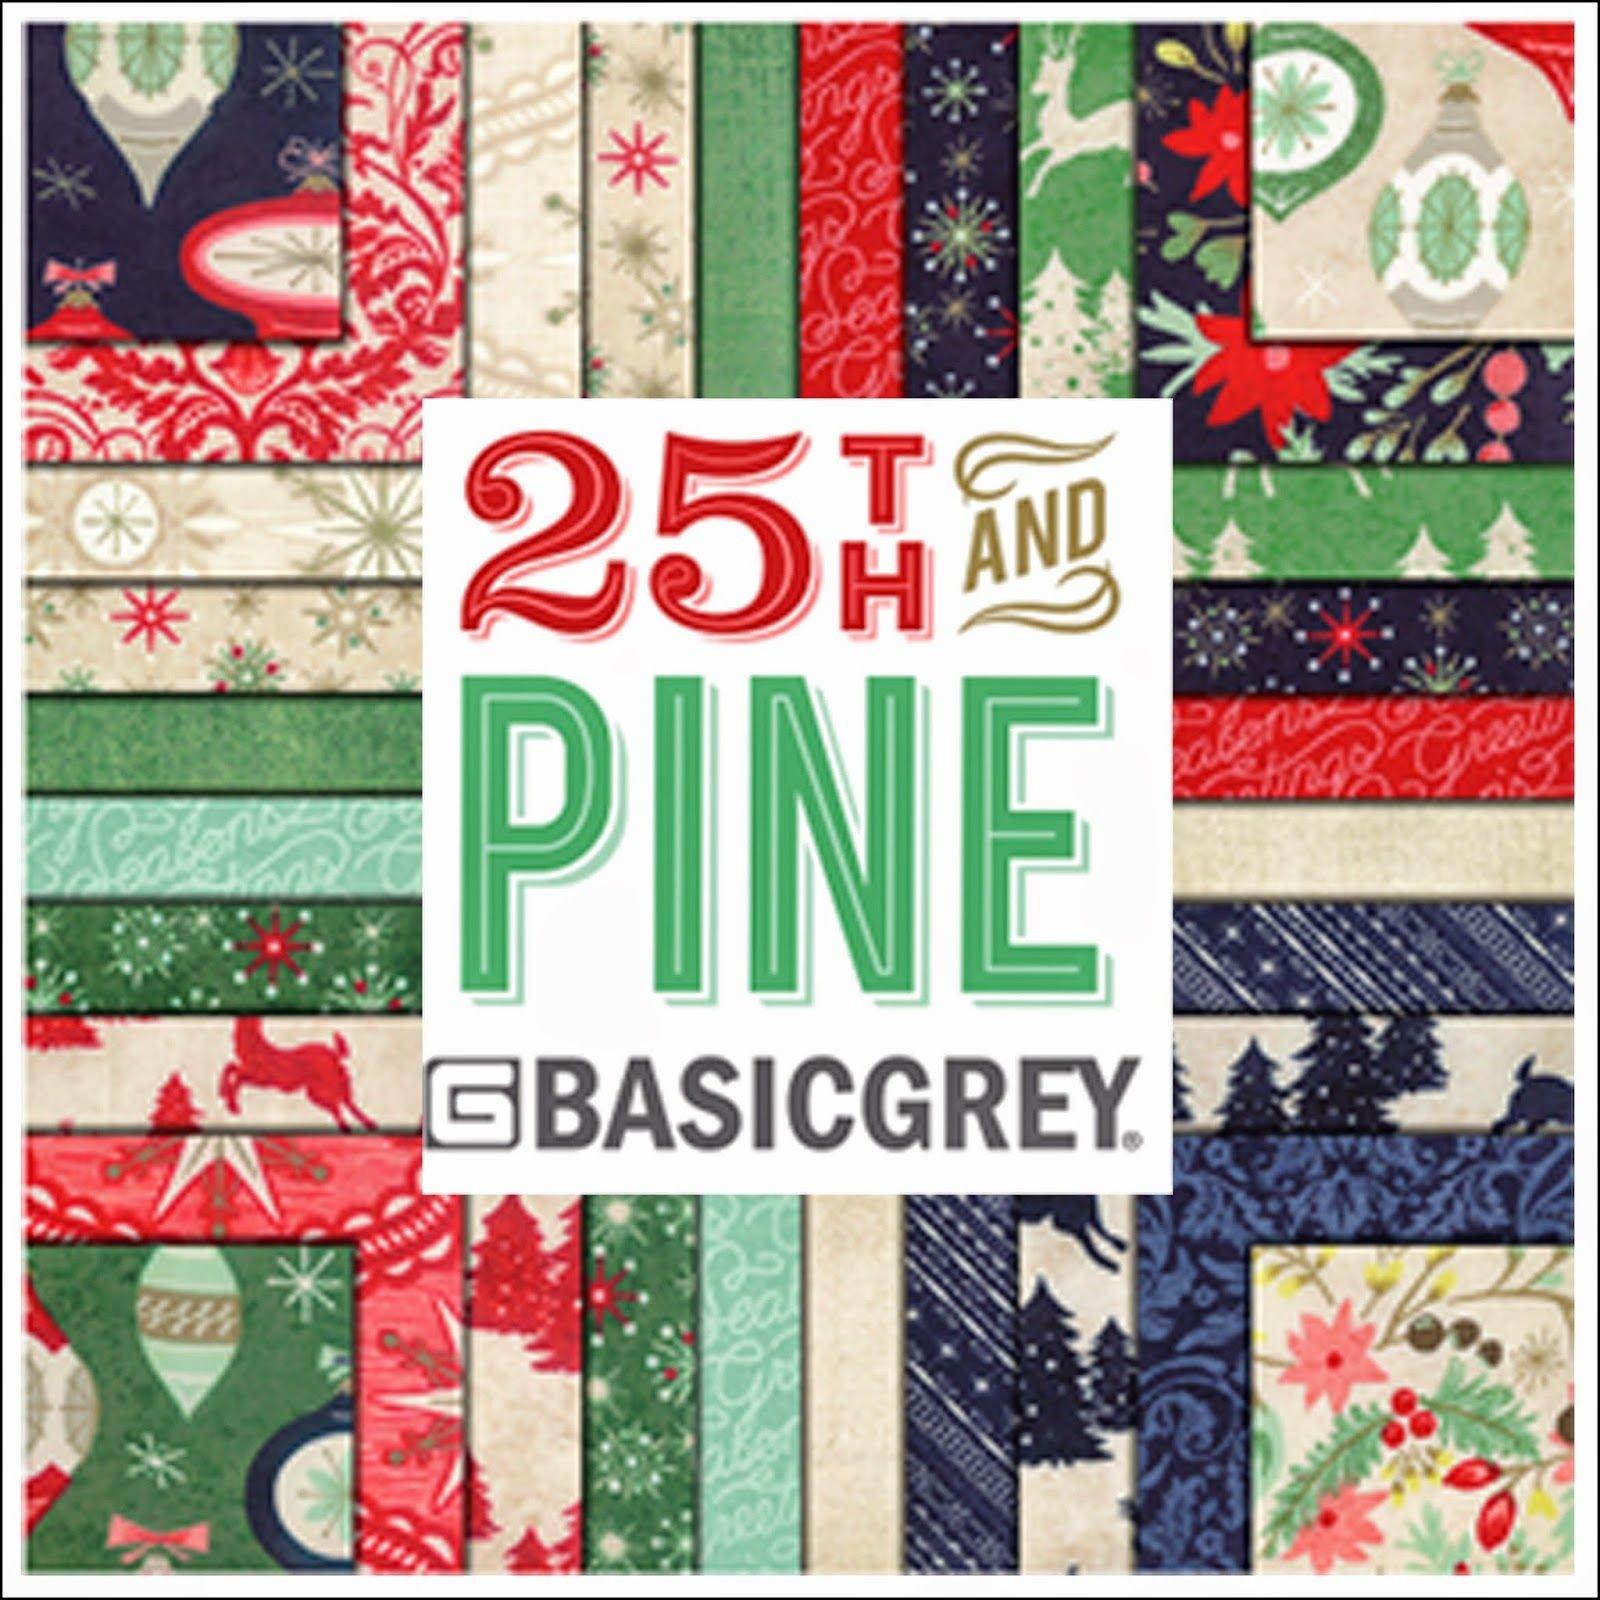 25th & Pine FQB (40 pcs) (Basic Grey)